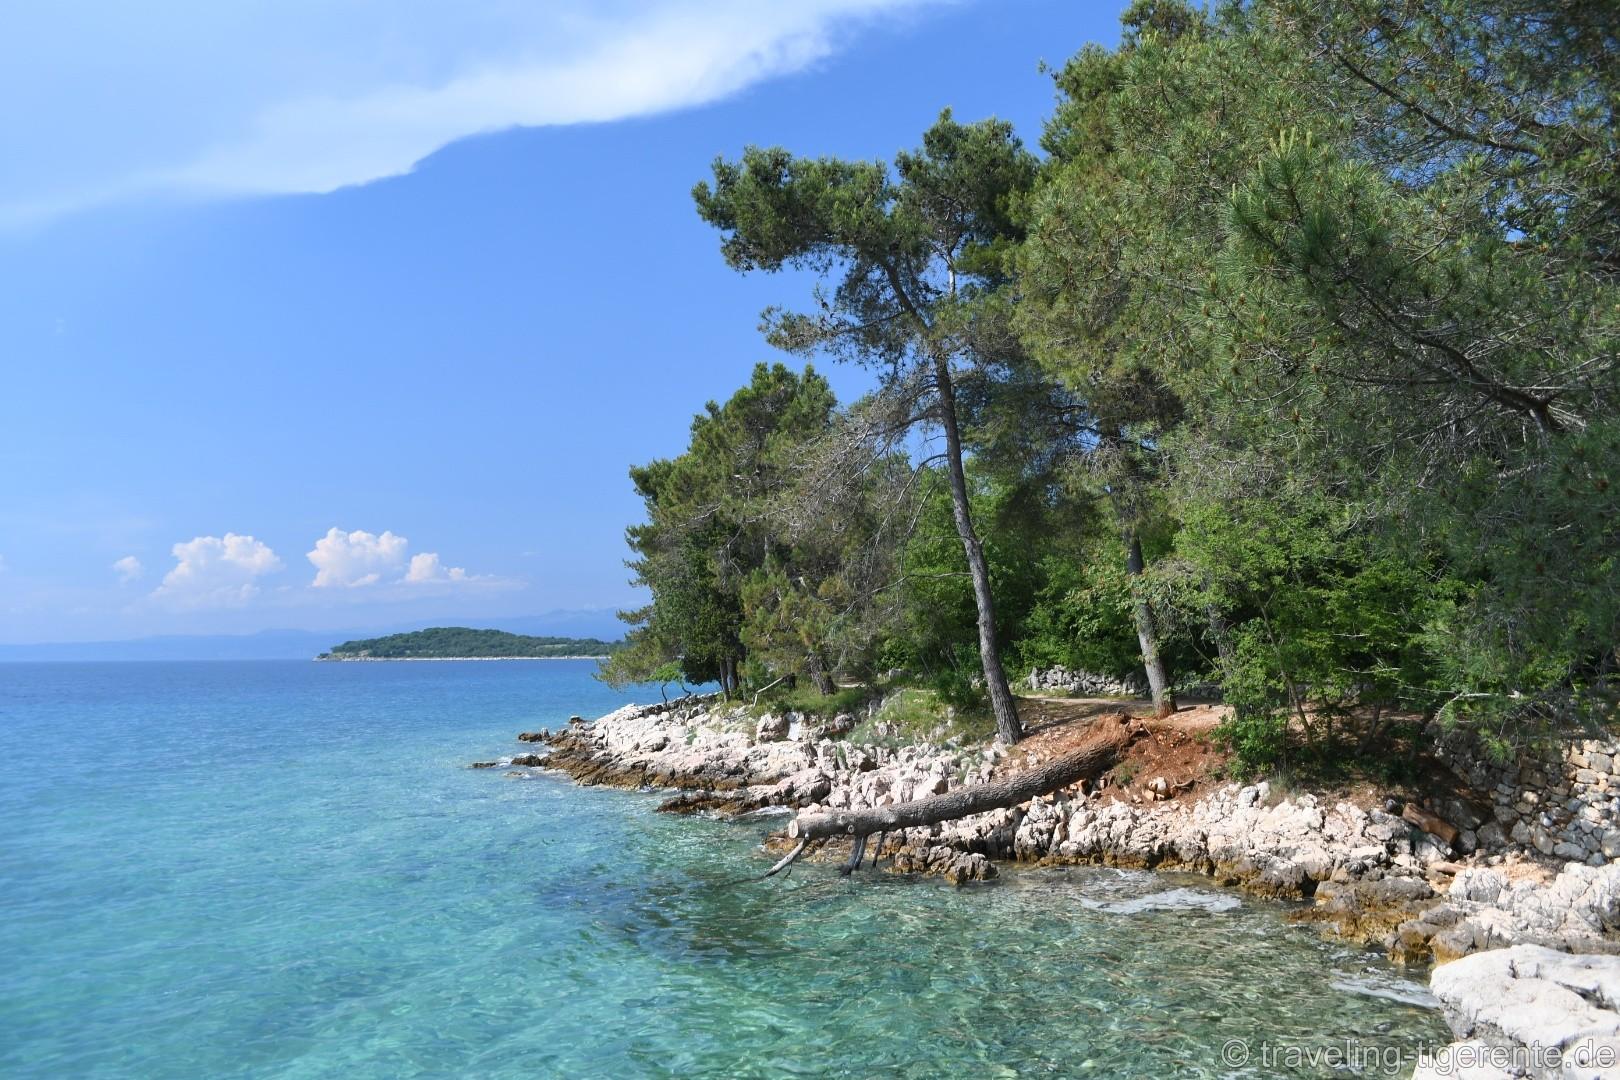 Wunderschöne Insel Krk